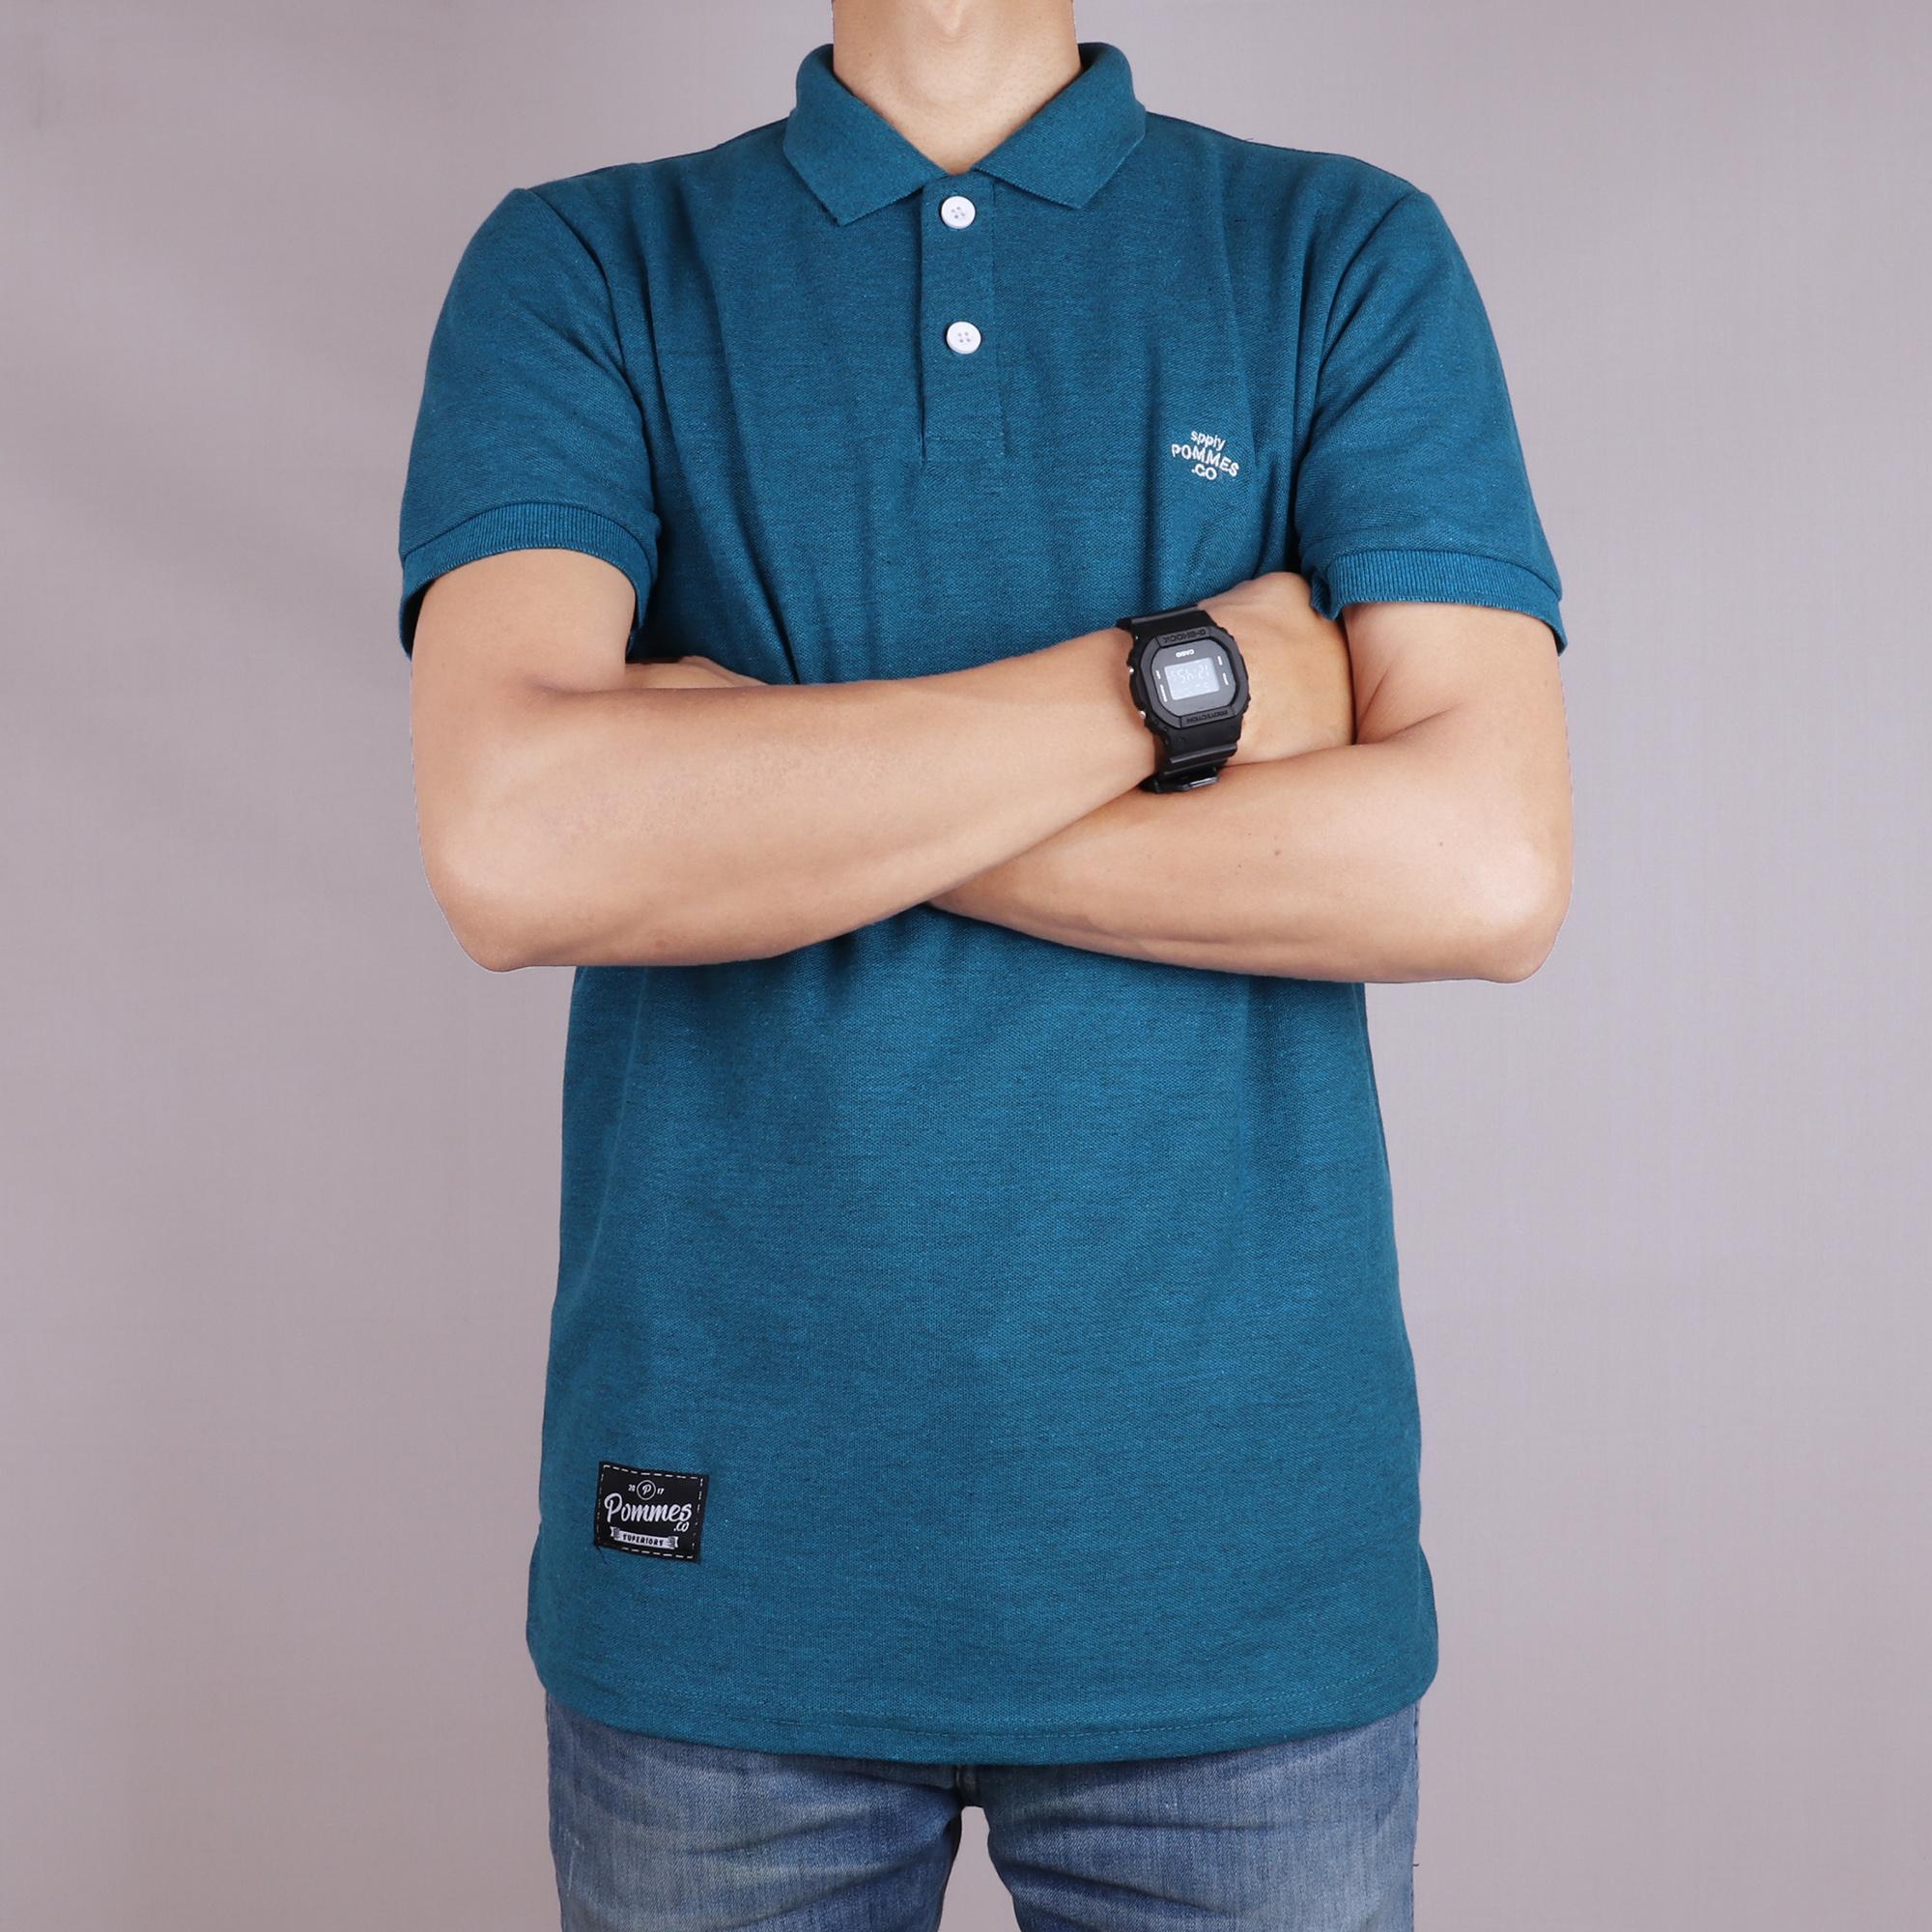 Kaos Polo Pria Premium Kaos Polo Cowok Exslusive Kekinian Kaos Kerah Lengan Pendek Elegan BIRU GLIT